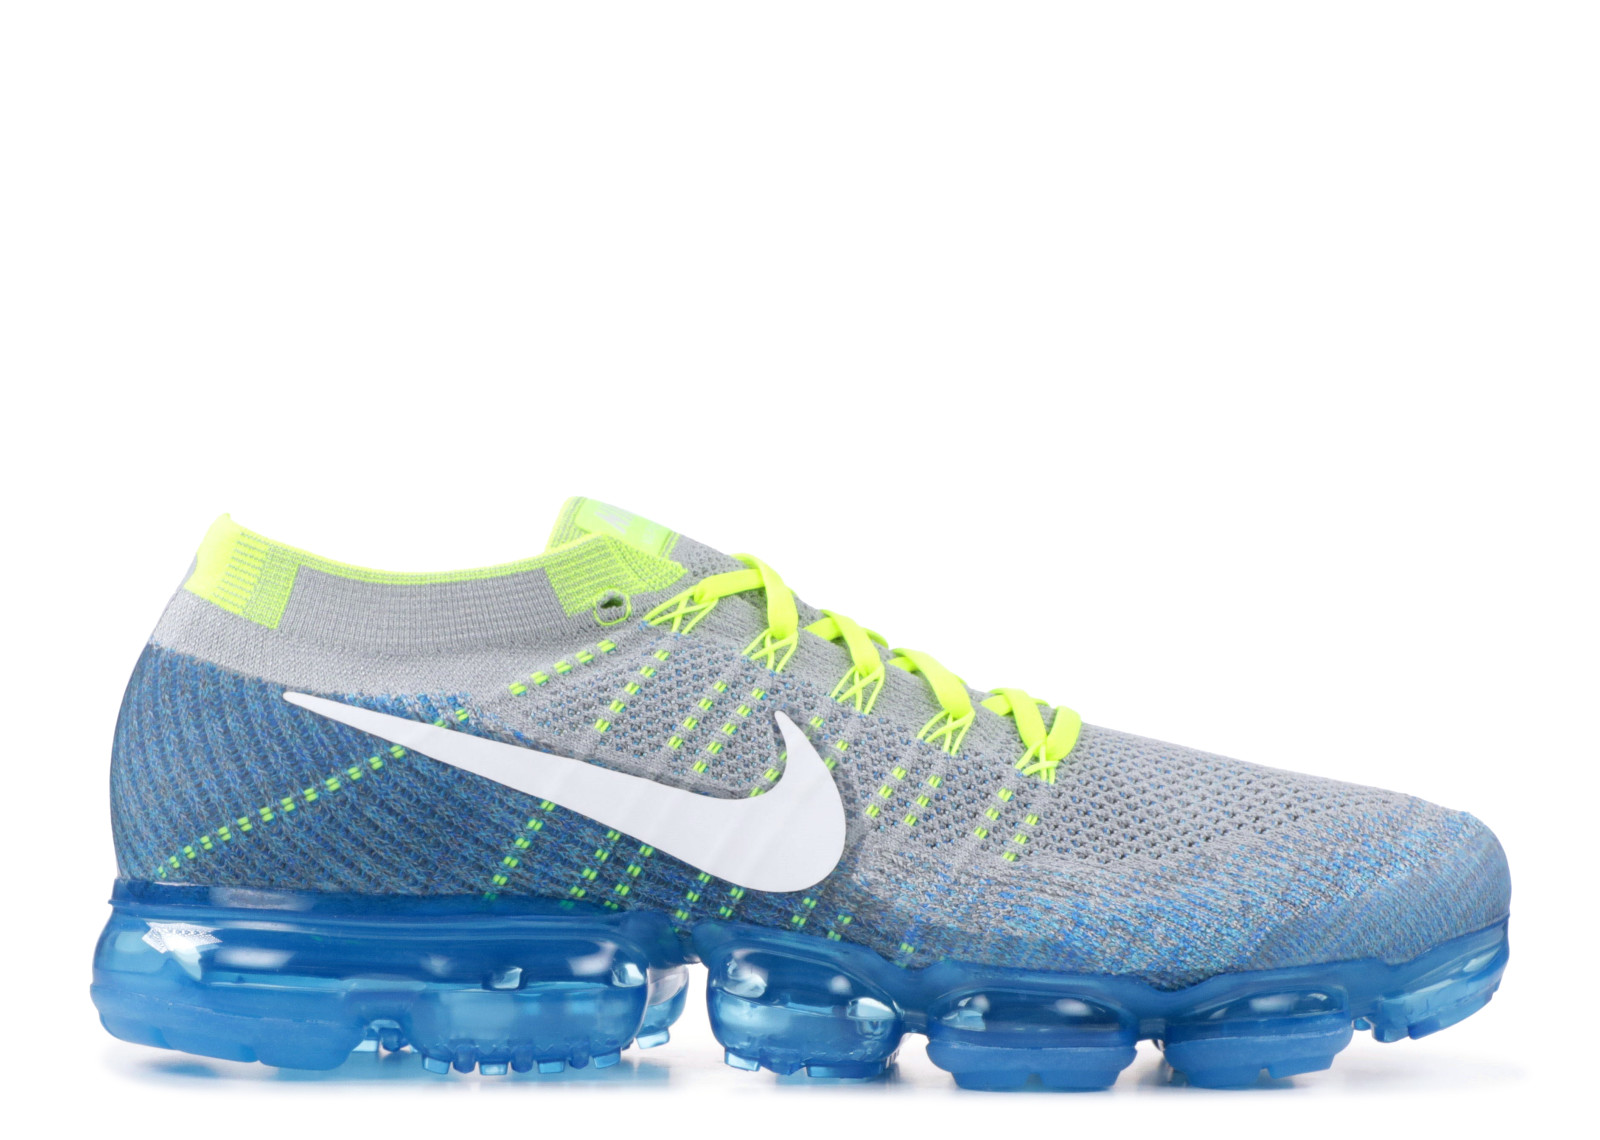 Nike - Men - Nike Air Vapormax Flyknit